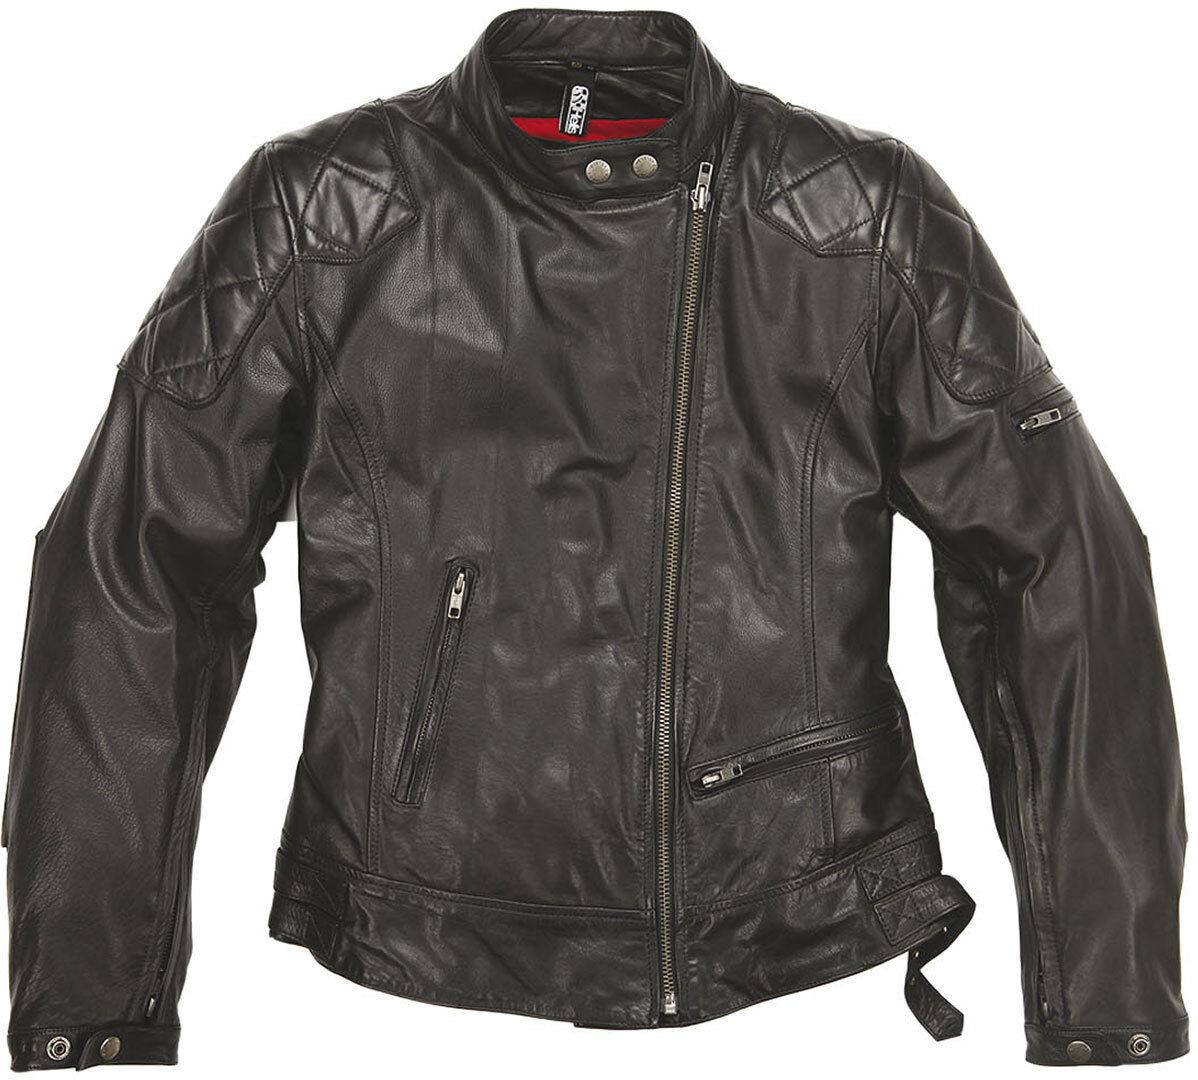 Helstons KS 70 Veste en cuir de dames Noir taille : 2XL